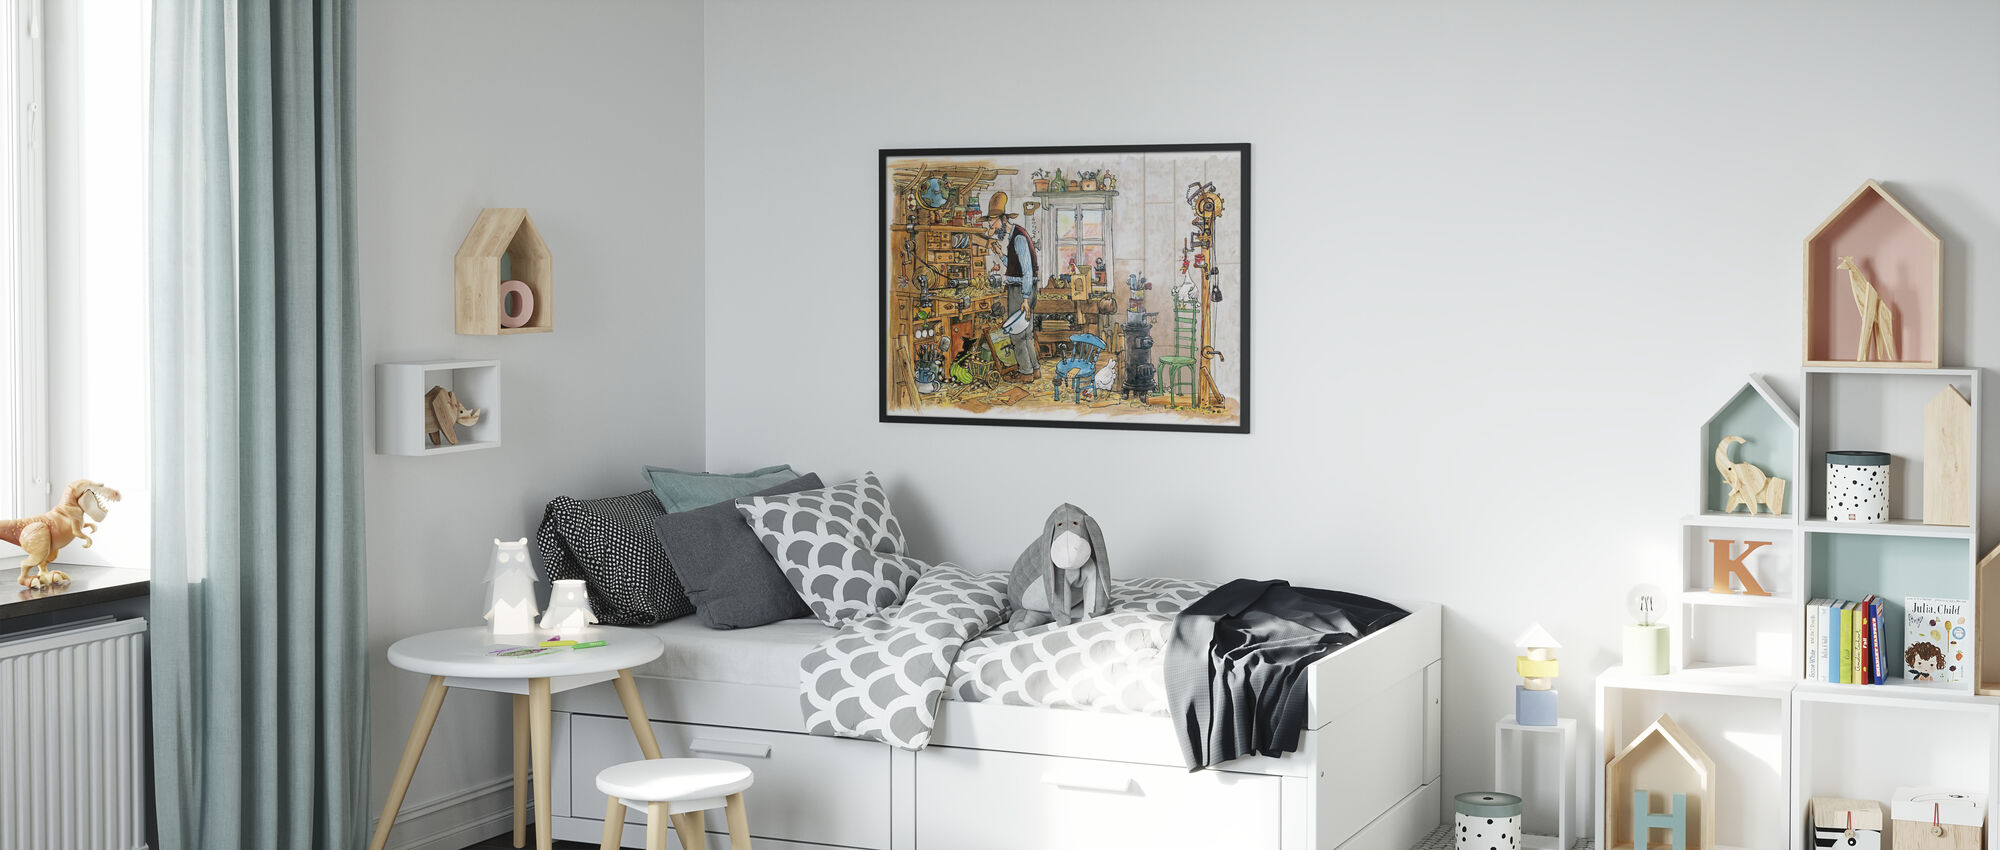 The carpenter - Poster - Kids Room